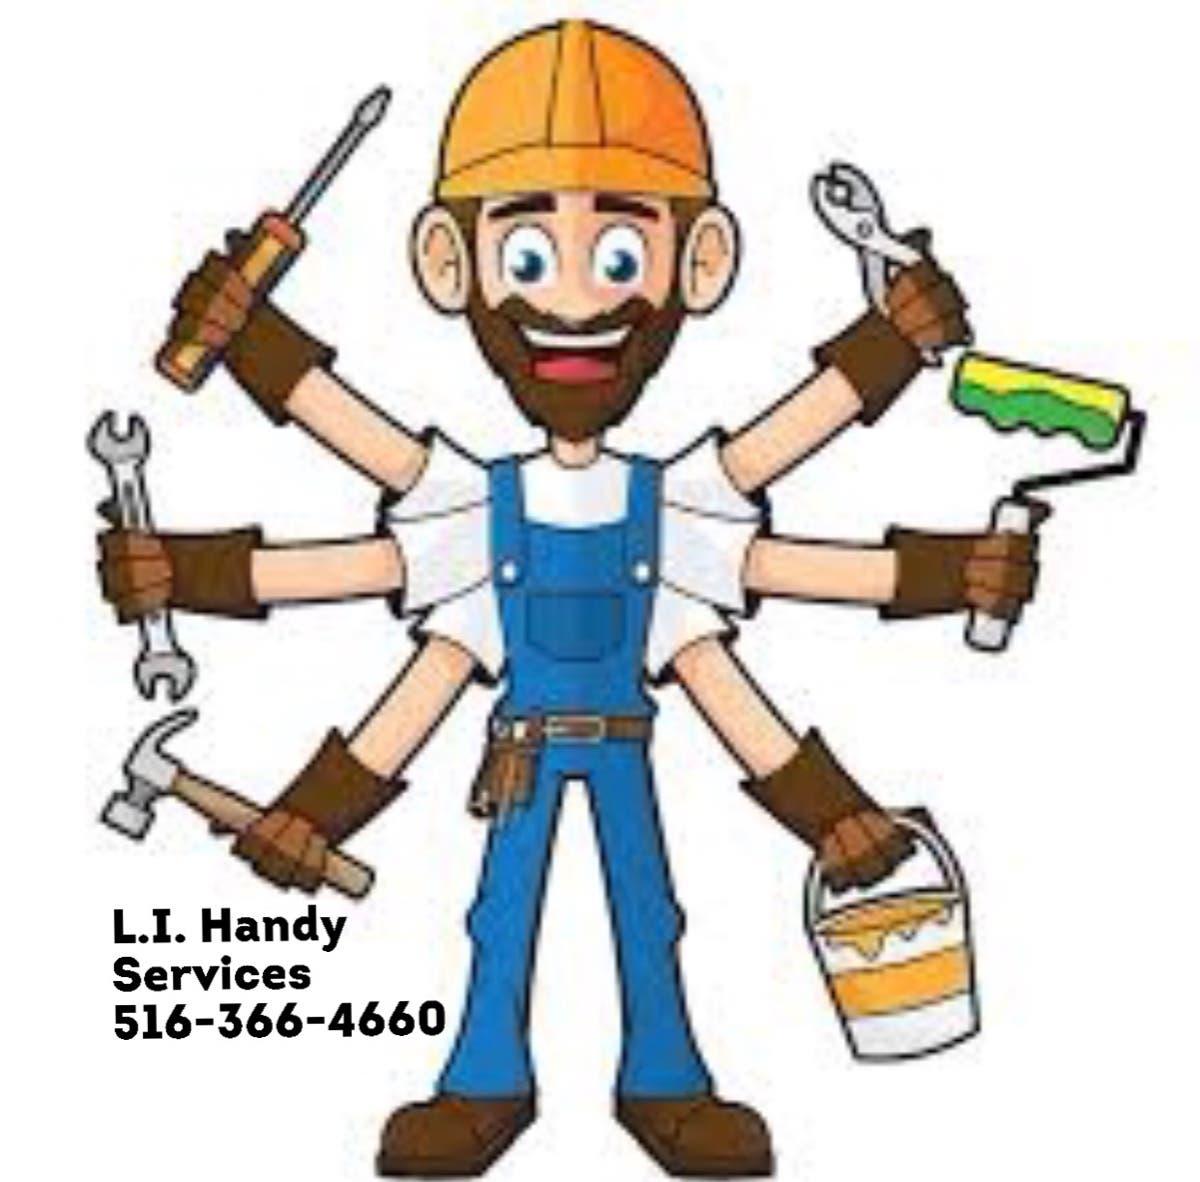 Home Repairs, Handywork, Remodeling, Total Home Service